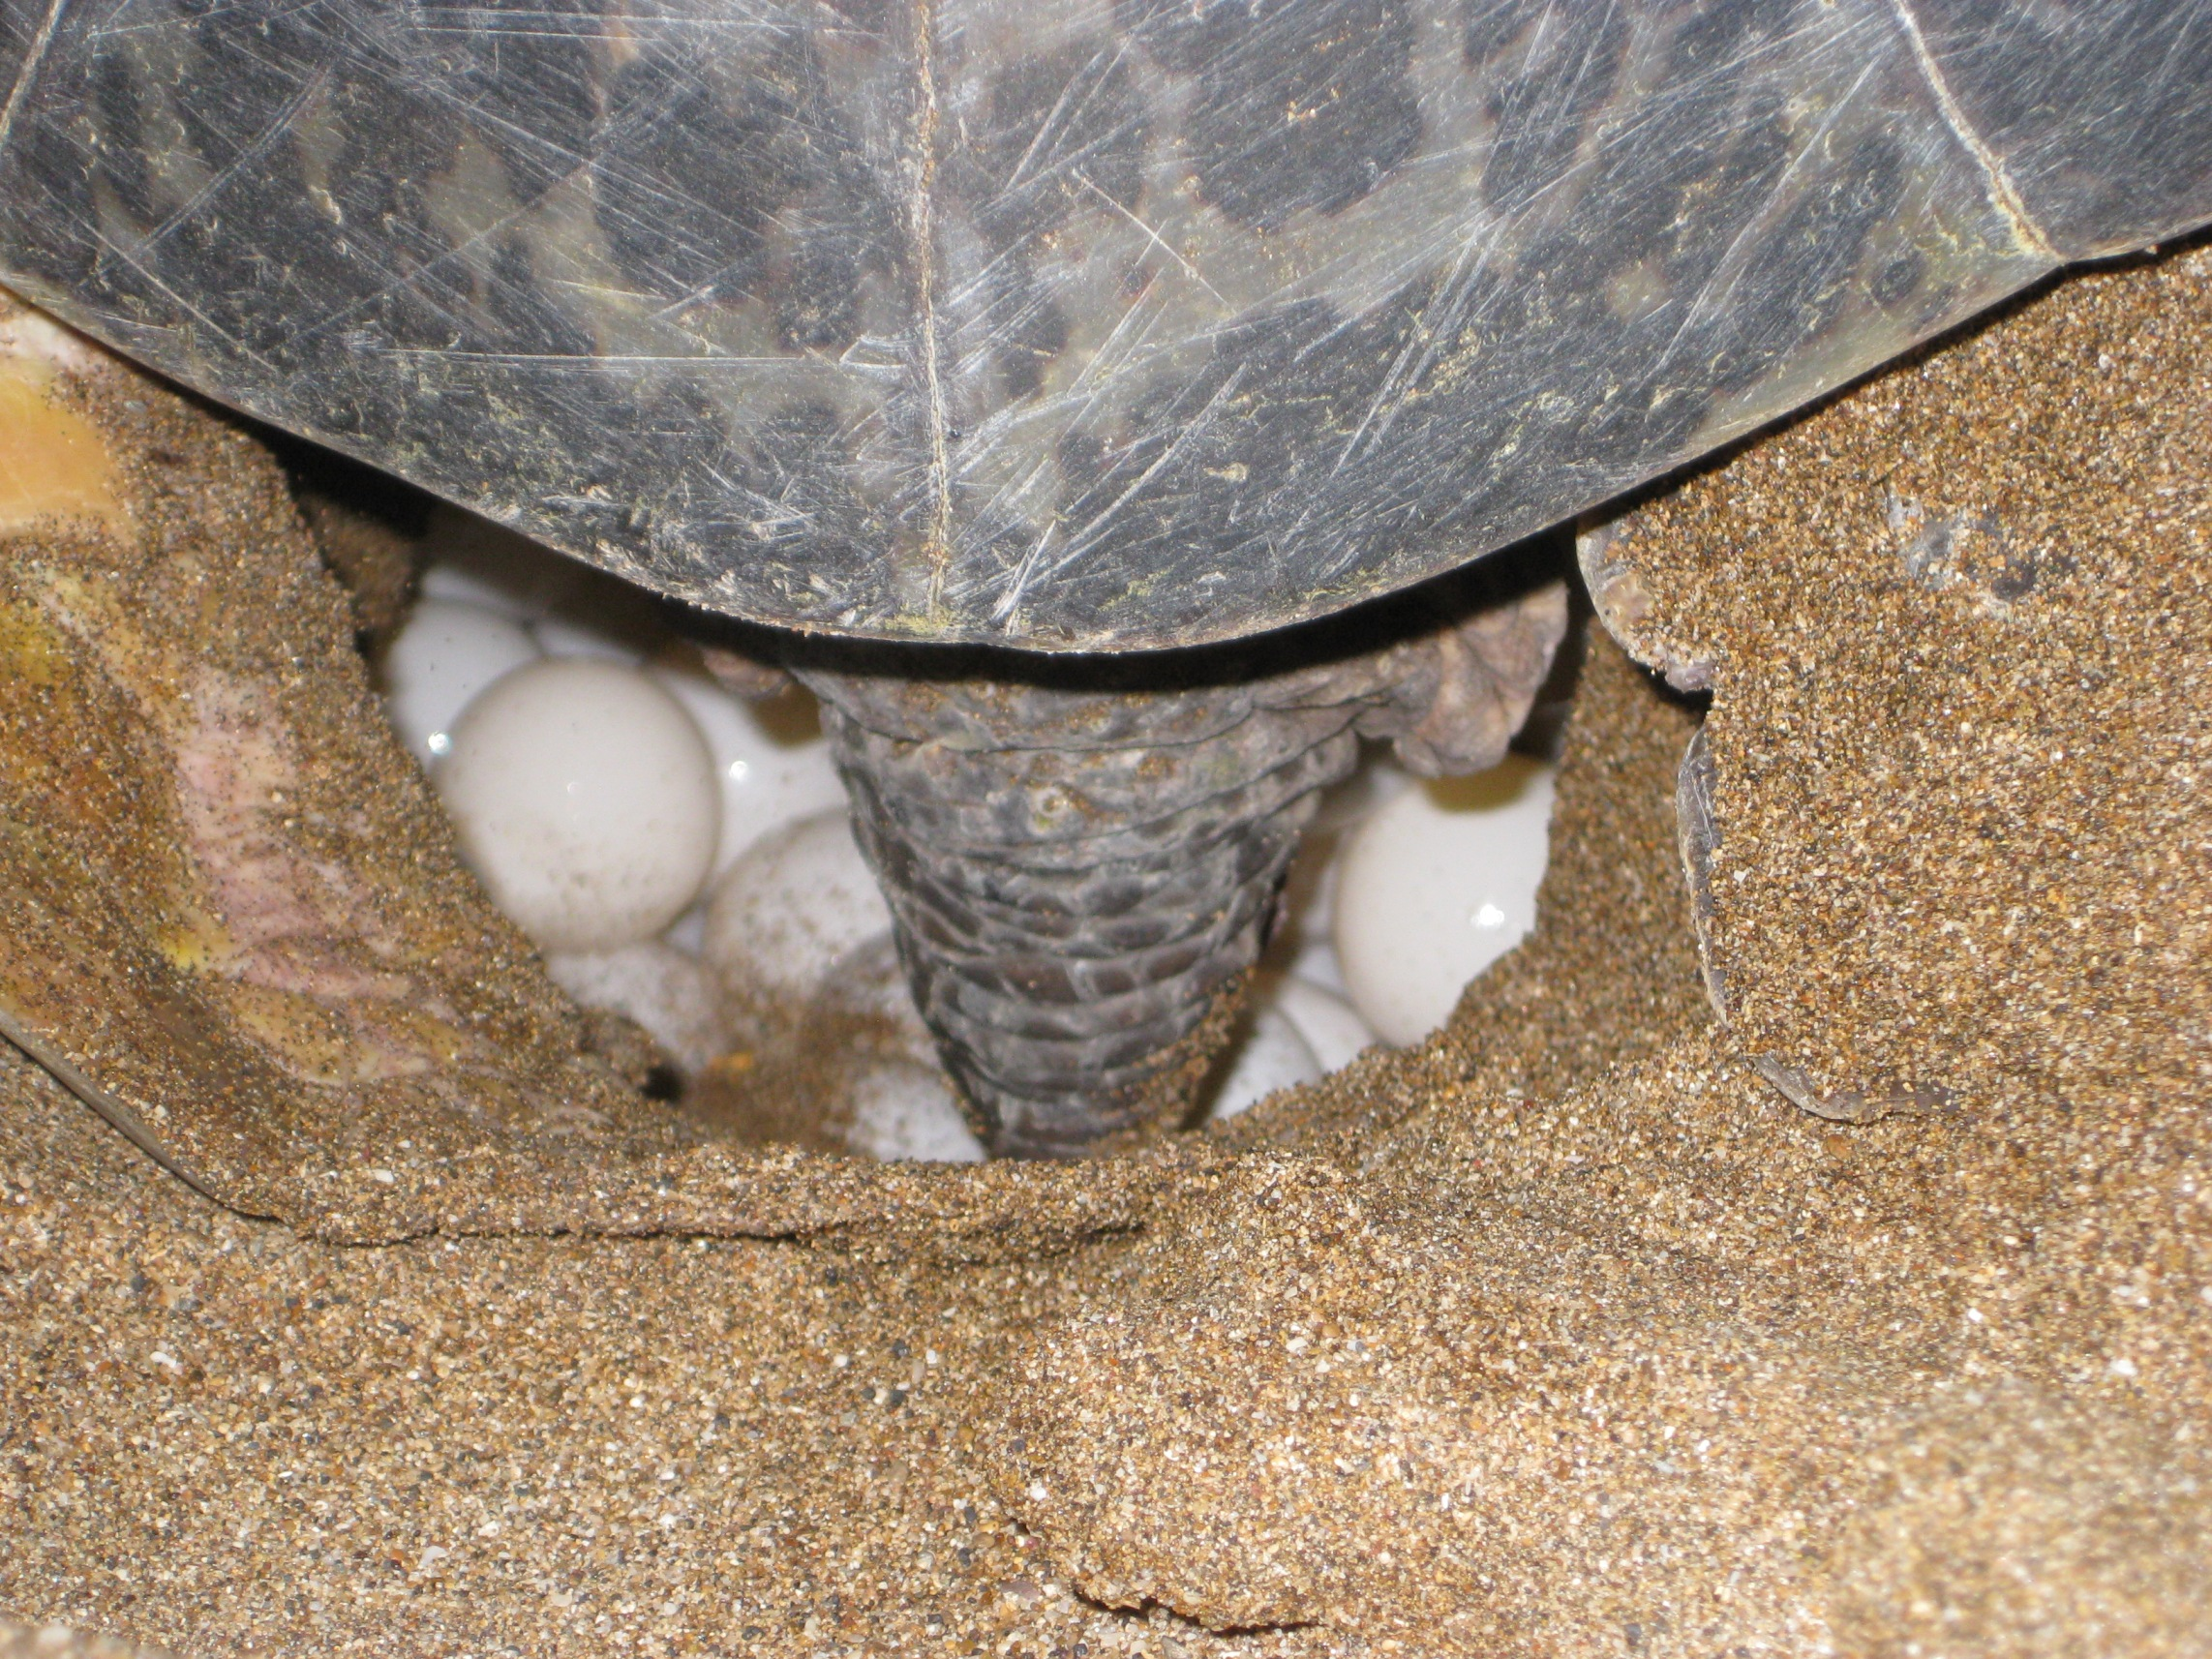 Sea turtles lay their eggs on the beach.